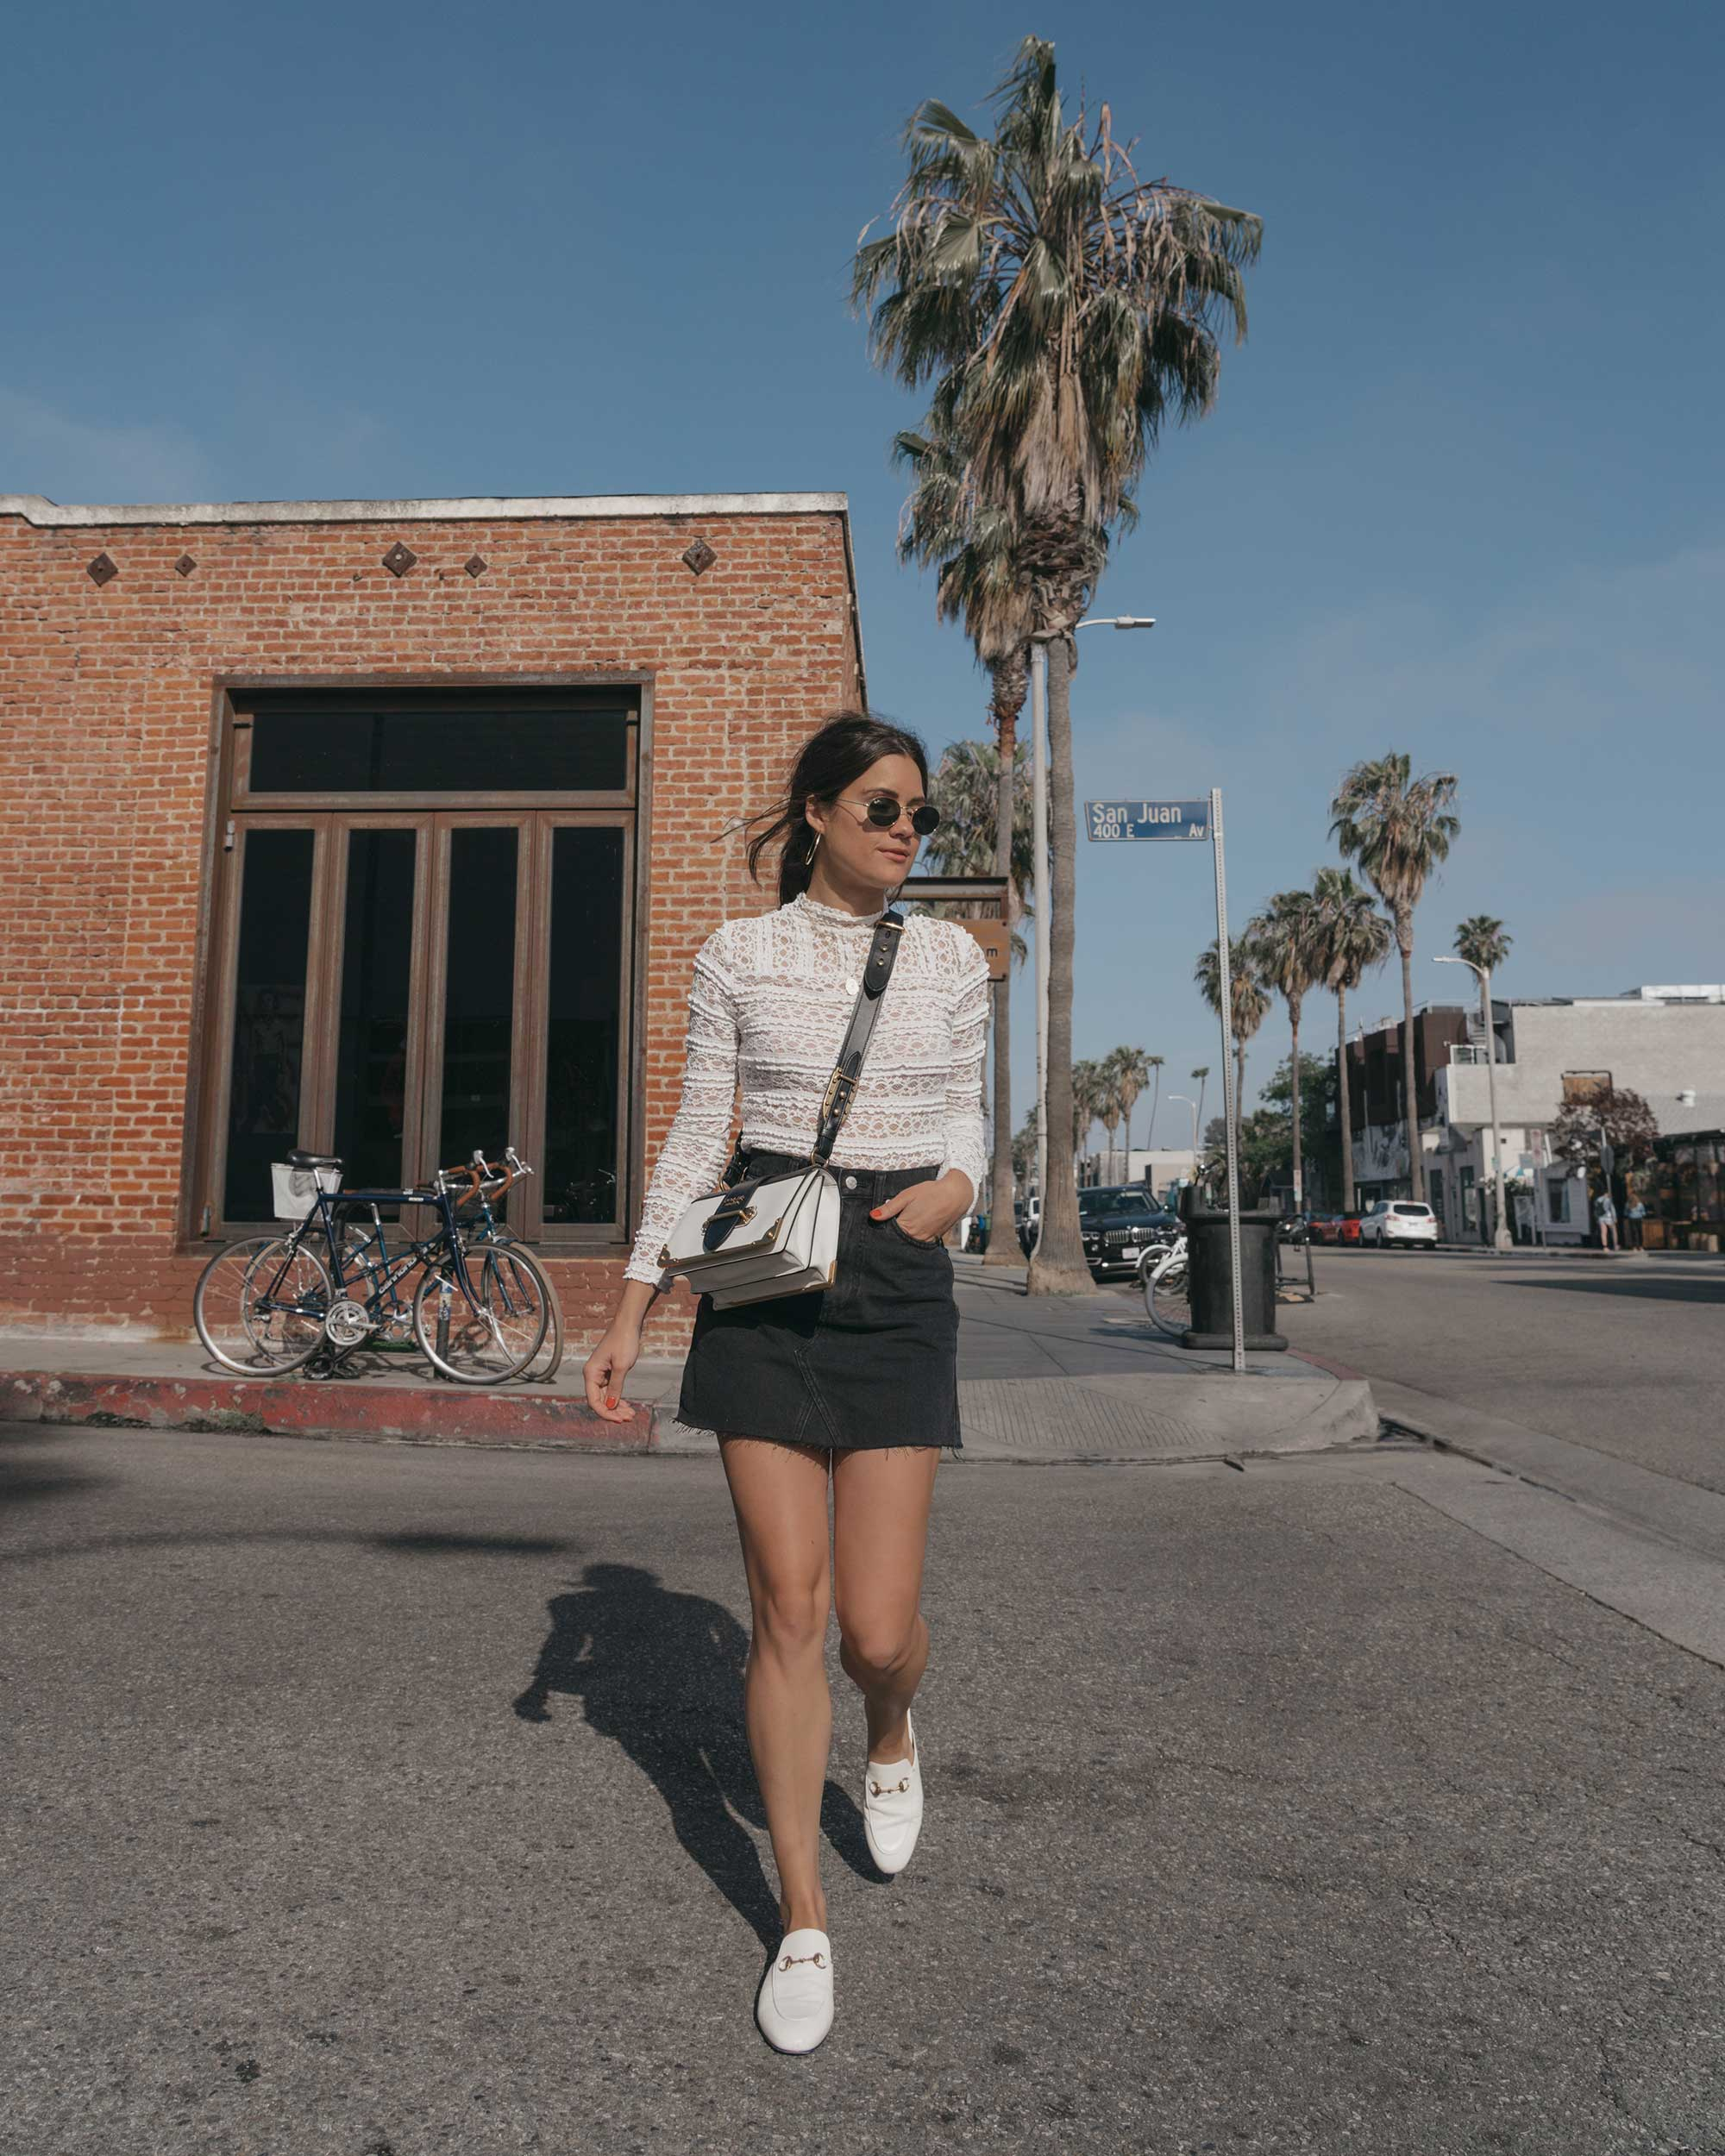 Prada City Saffiano Leather Cahier Bag, Black Denim Skirt, Summer outfit, Abbot Kinney California2.jpg